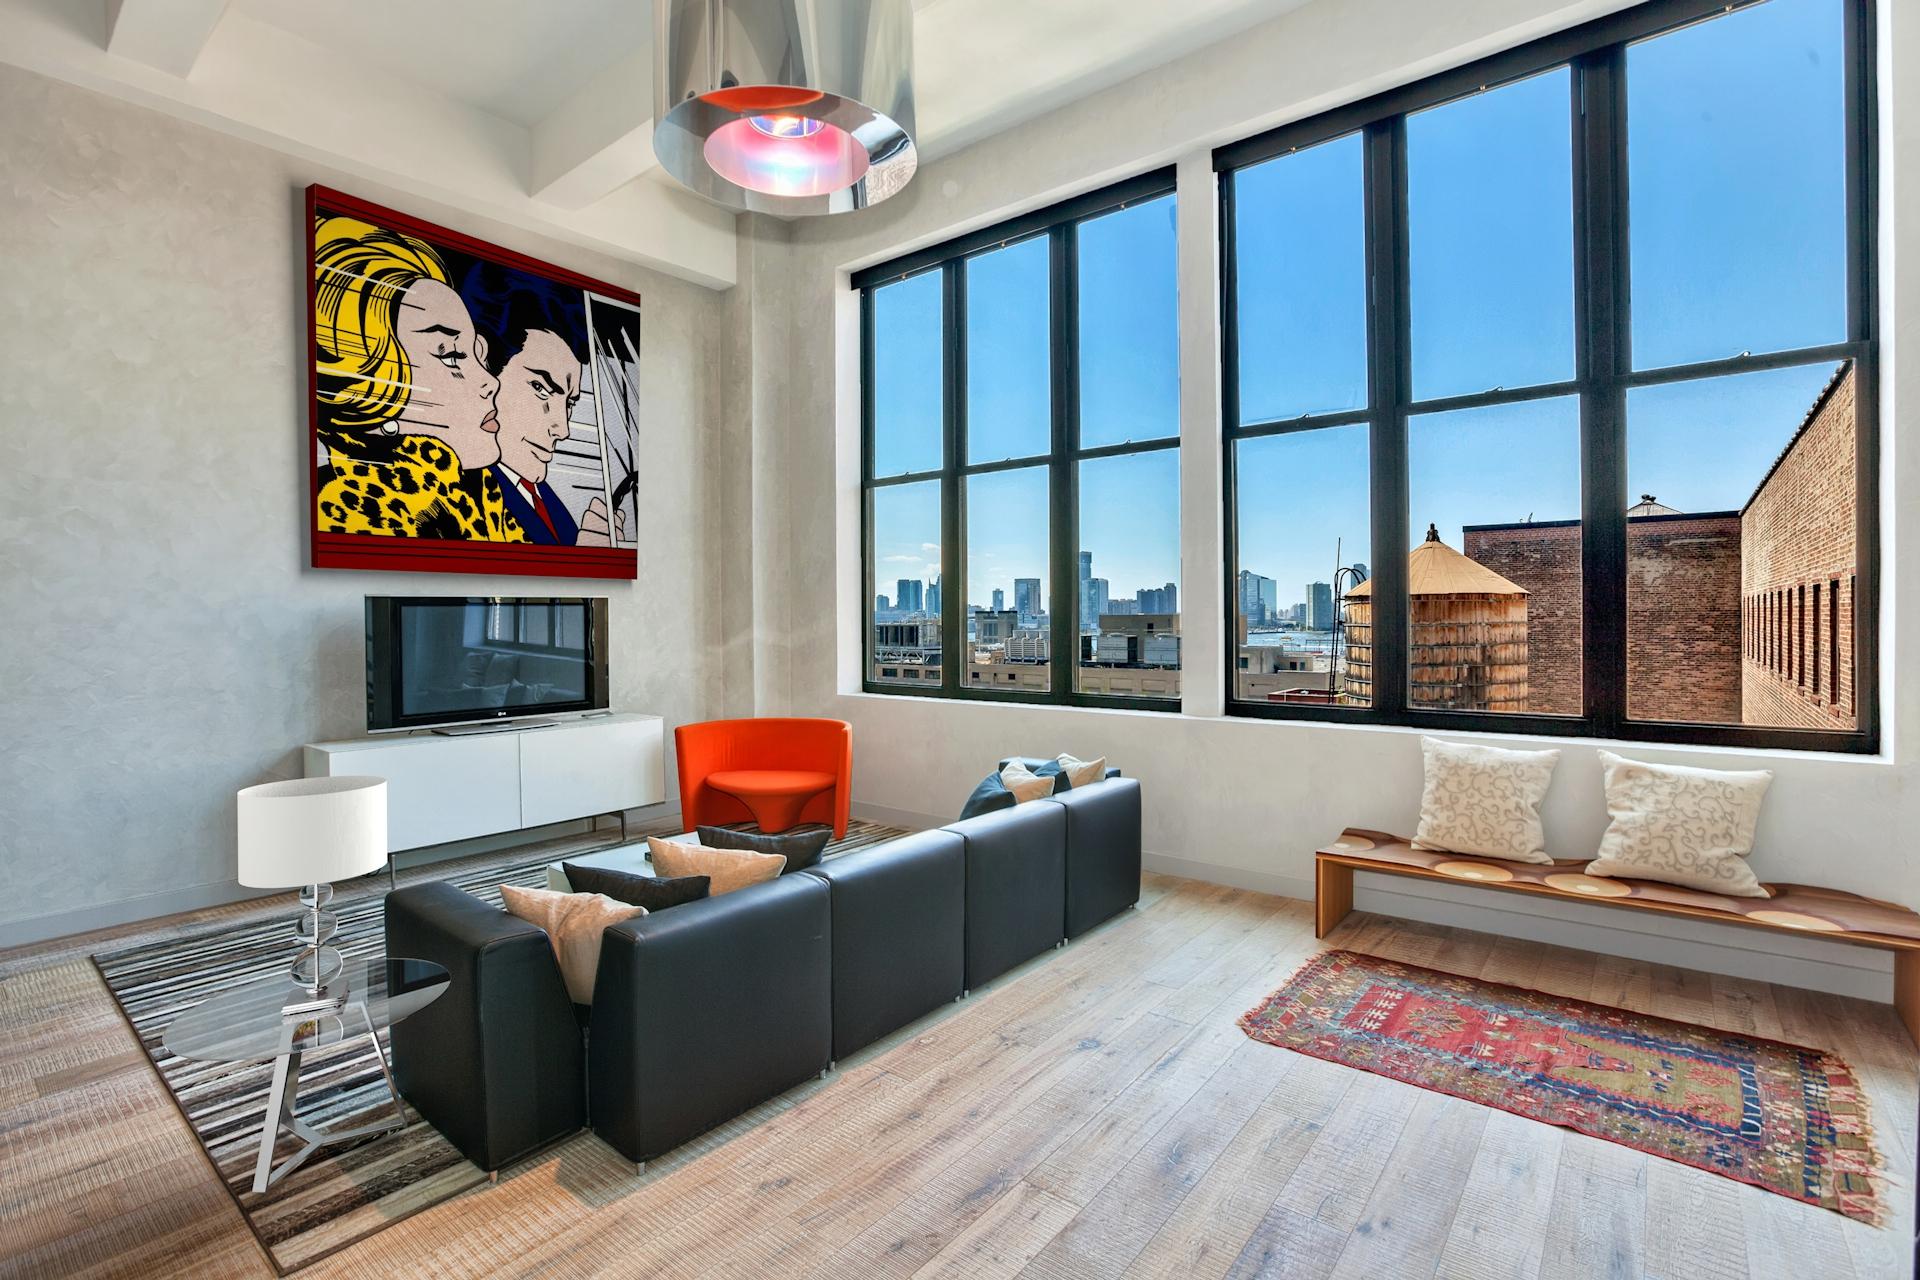 421 Hudson Street, #719 - $4,250,000